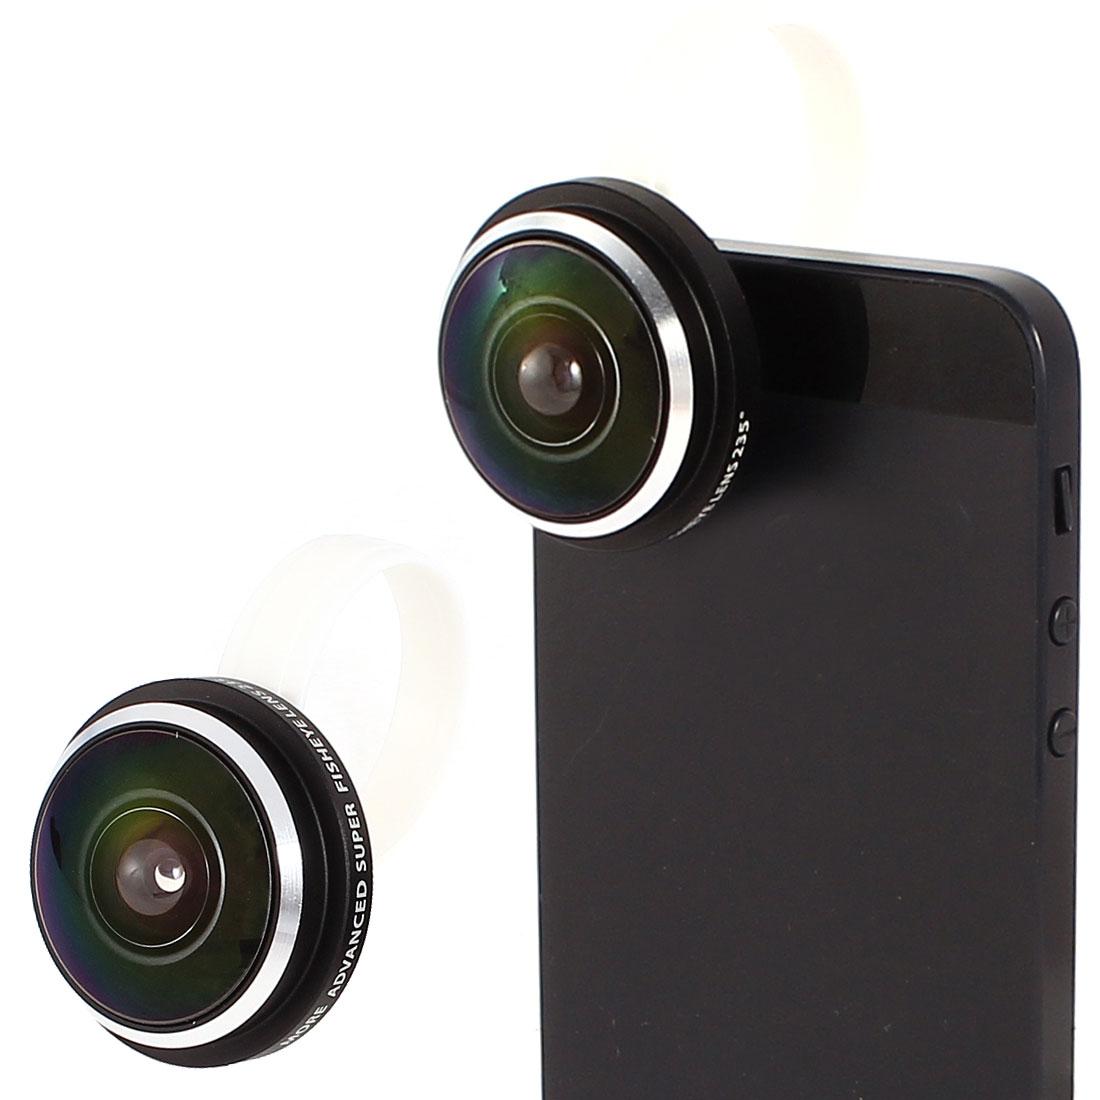 Screw-on Detachable 235 Degree Fish Eye Camera Lens for Mobile Phone